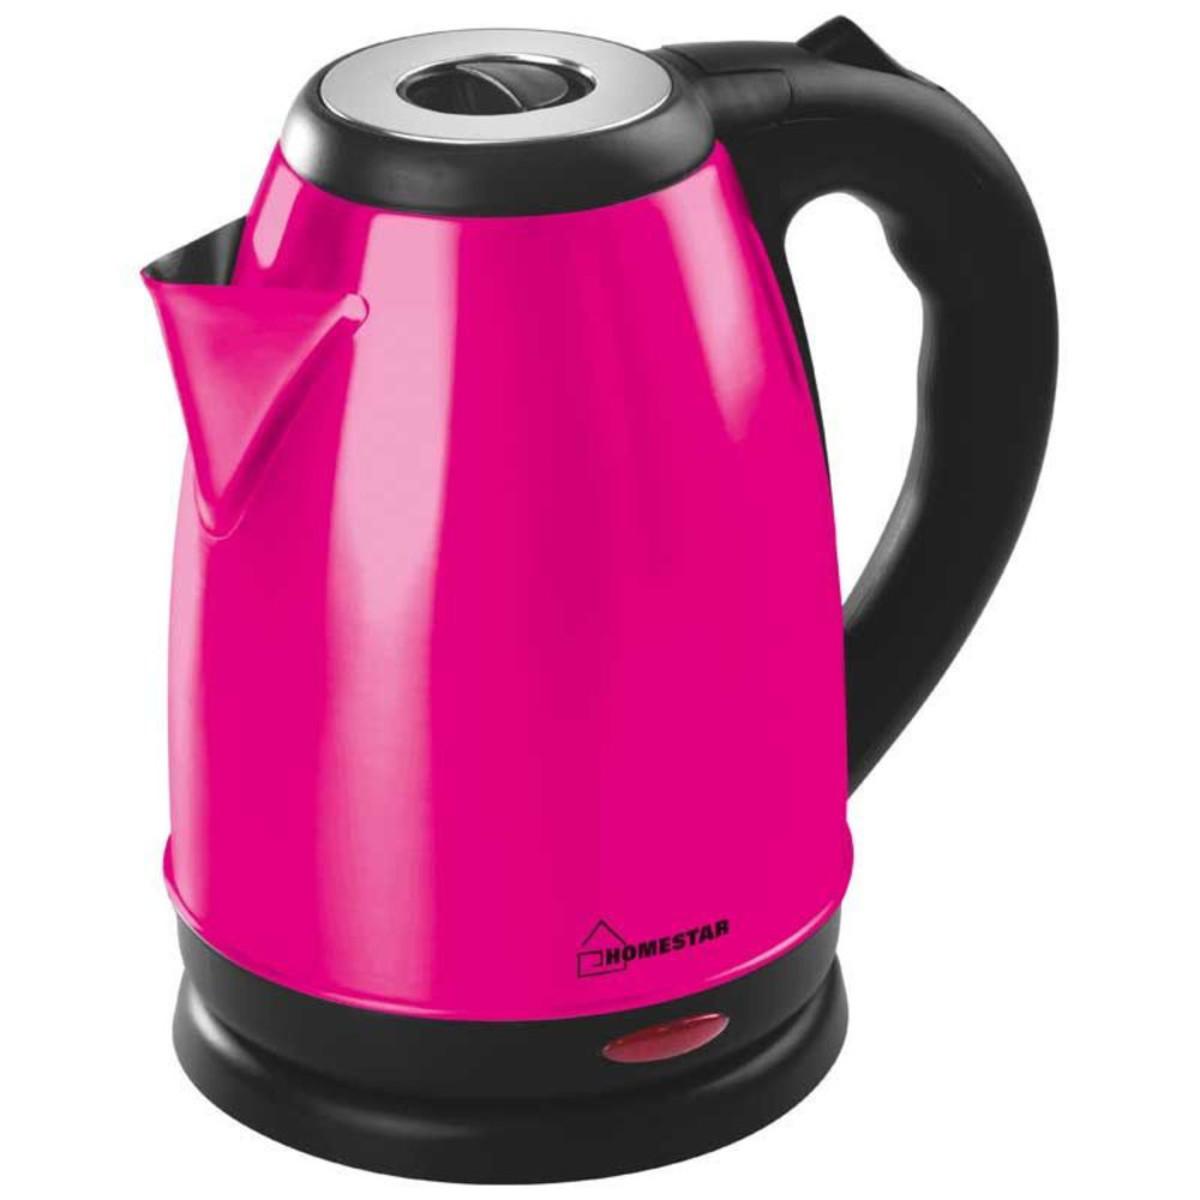 Электрический чайник HomeStar HS-1020 5969